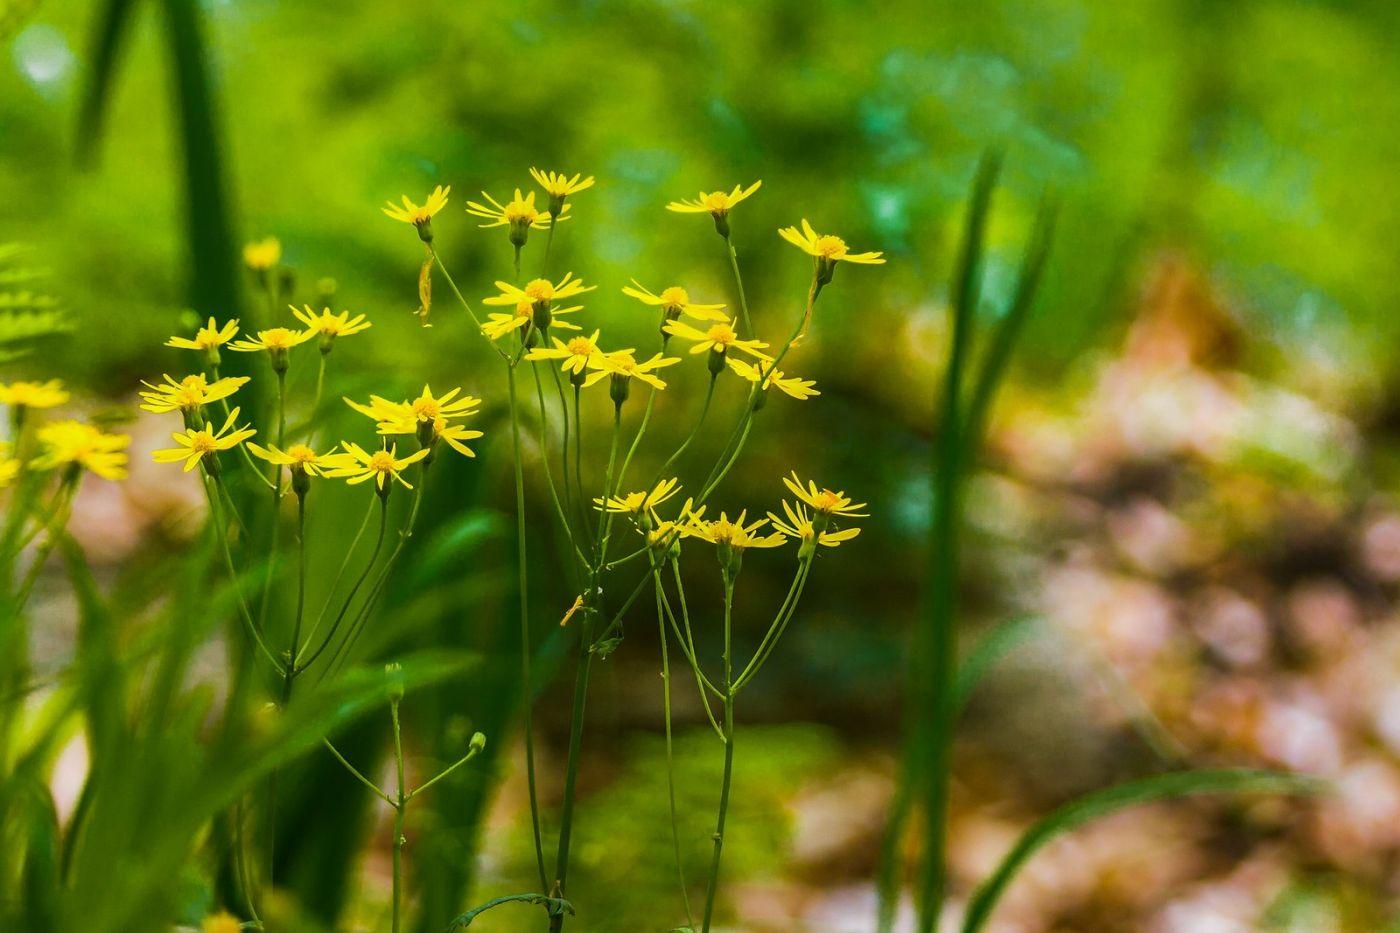 Chanticleer花园,有梦想的季节_图1-11